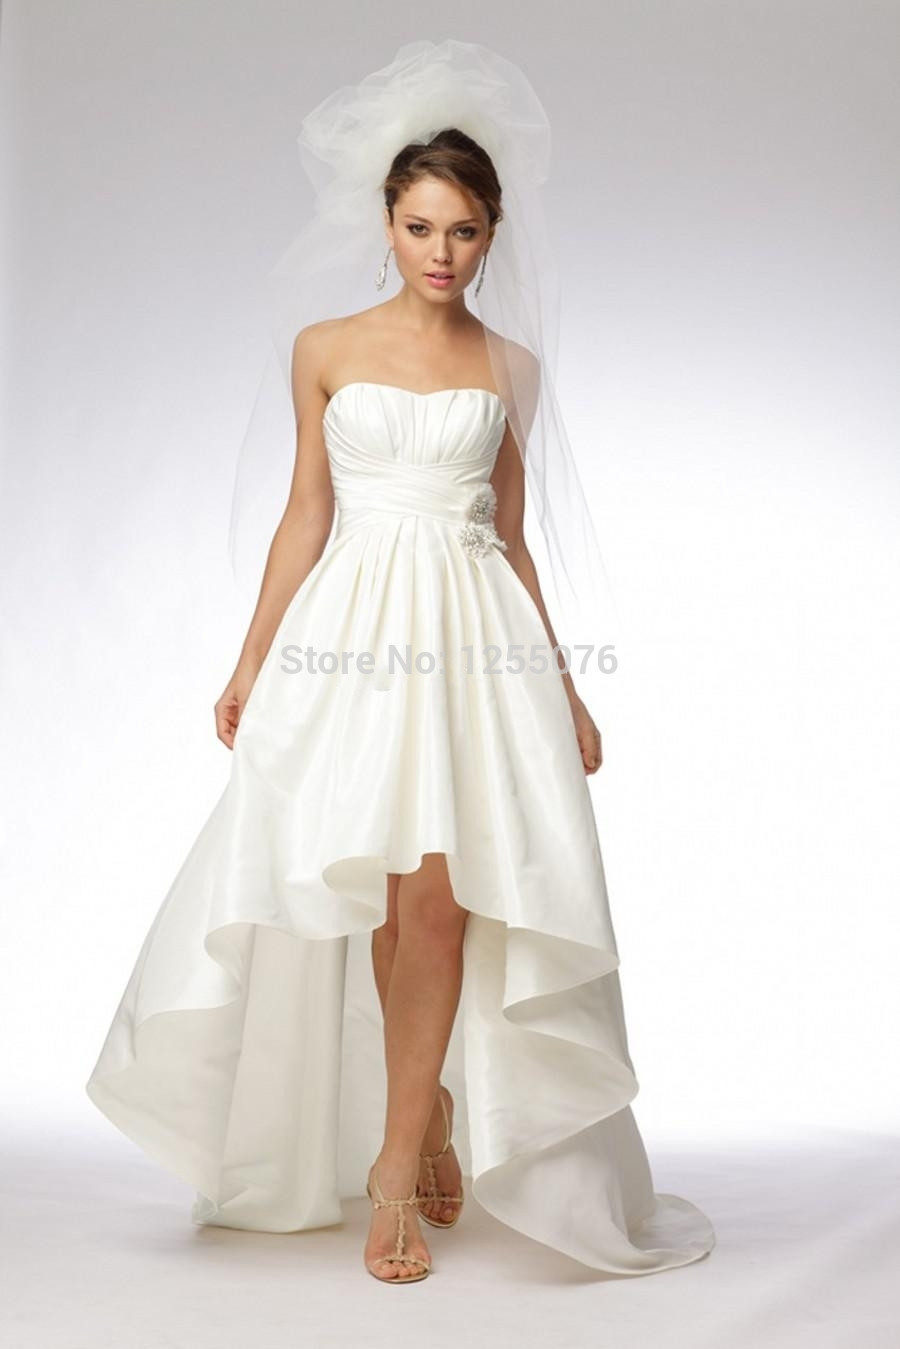 Hi-lo Wedding Dresses  New 2014 Simple Wedding Dresses Strapless y Hi Lo Sheer